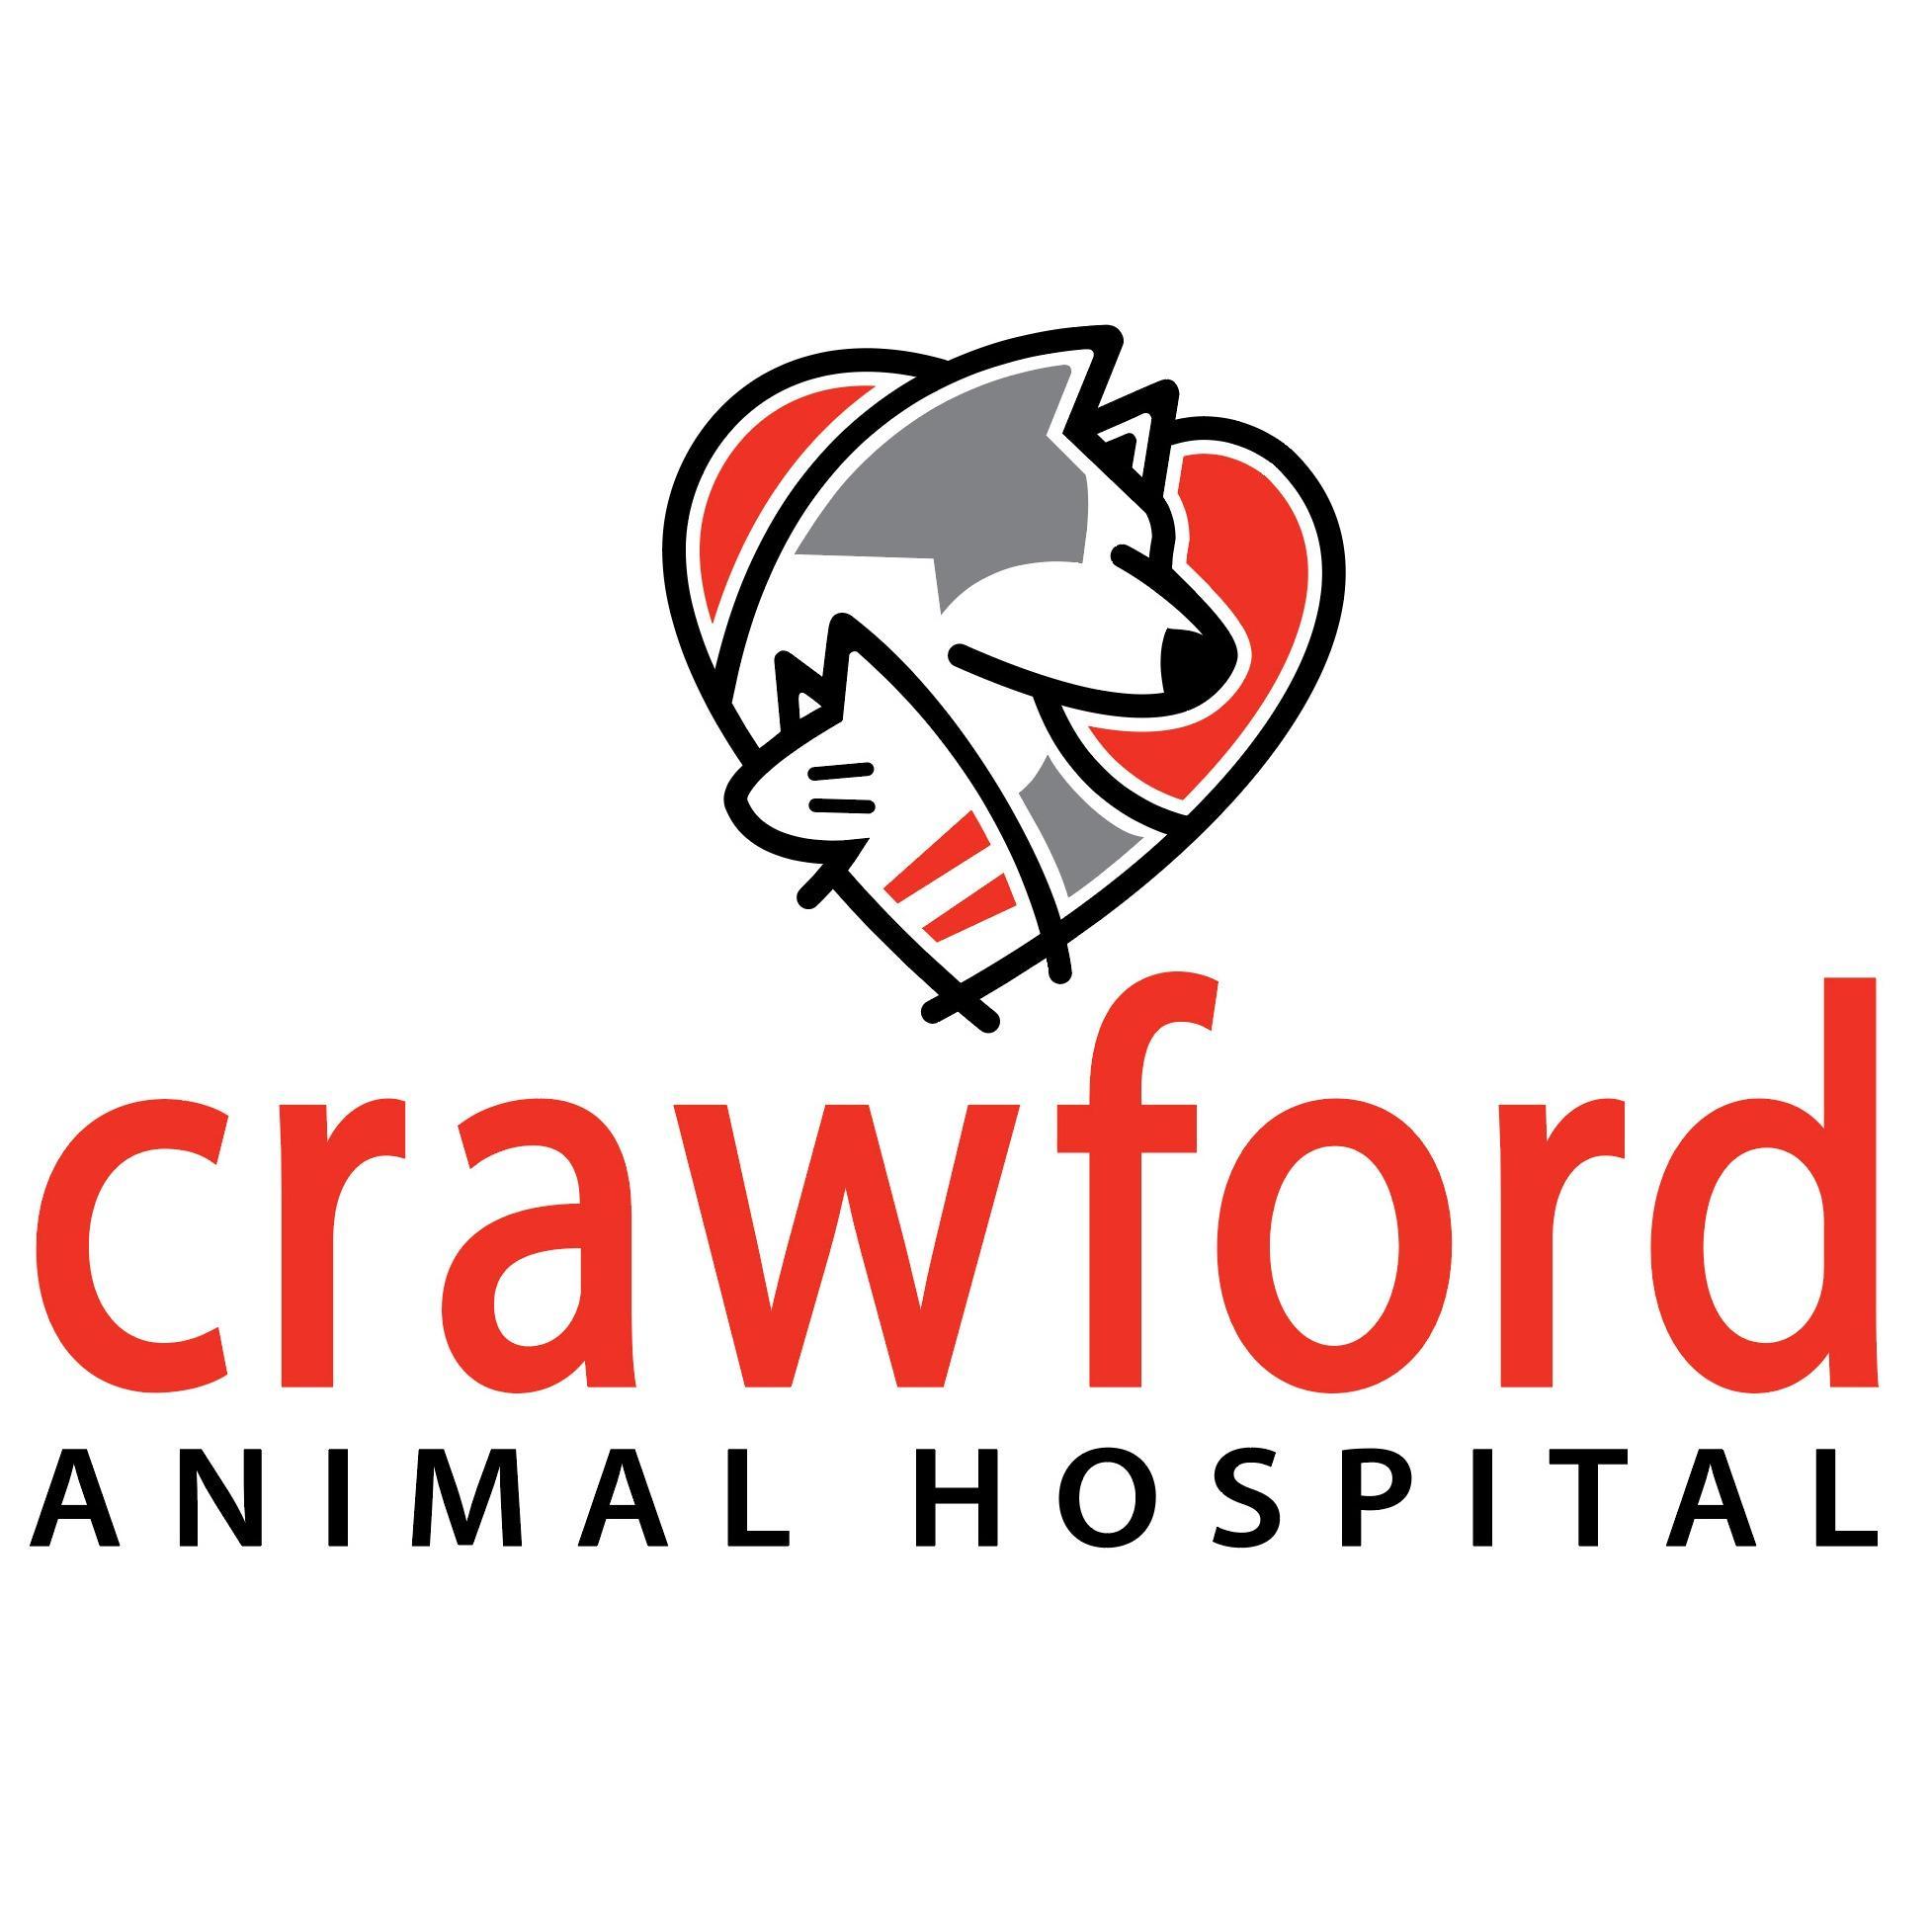 Crawford Animal Hospital - Greenfield, WI - Veterinarians